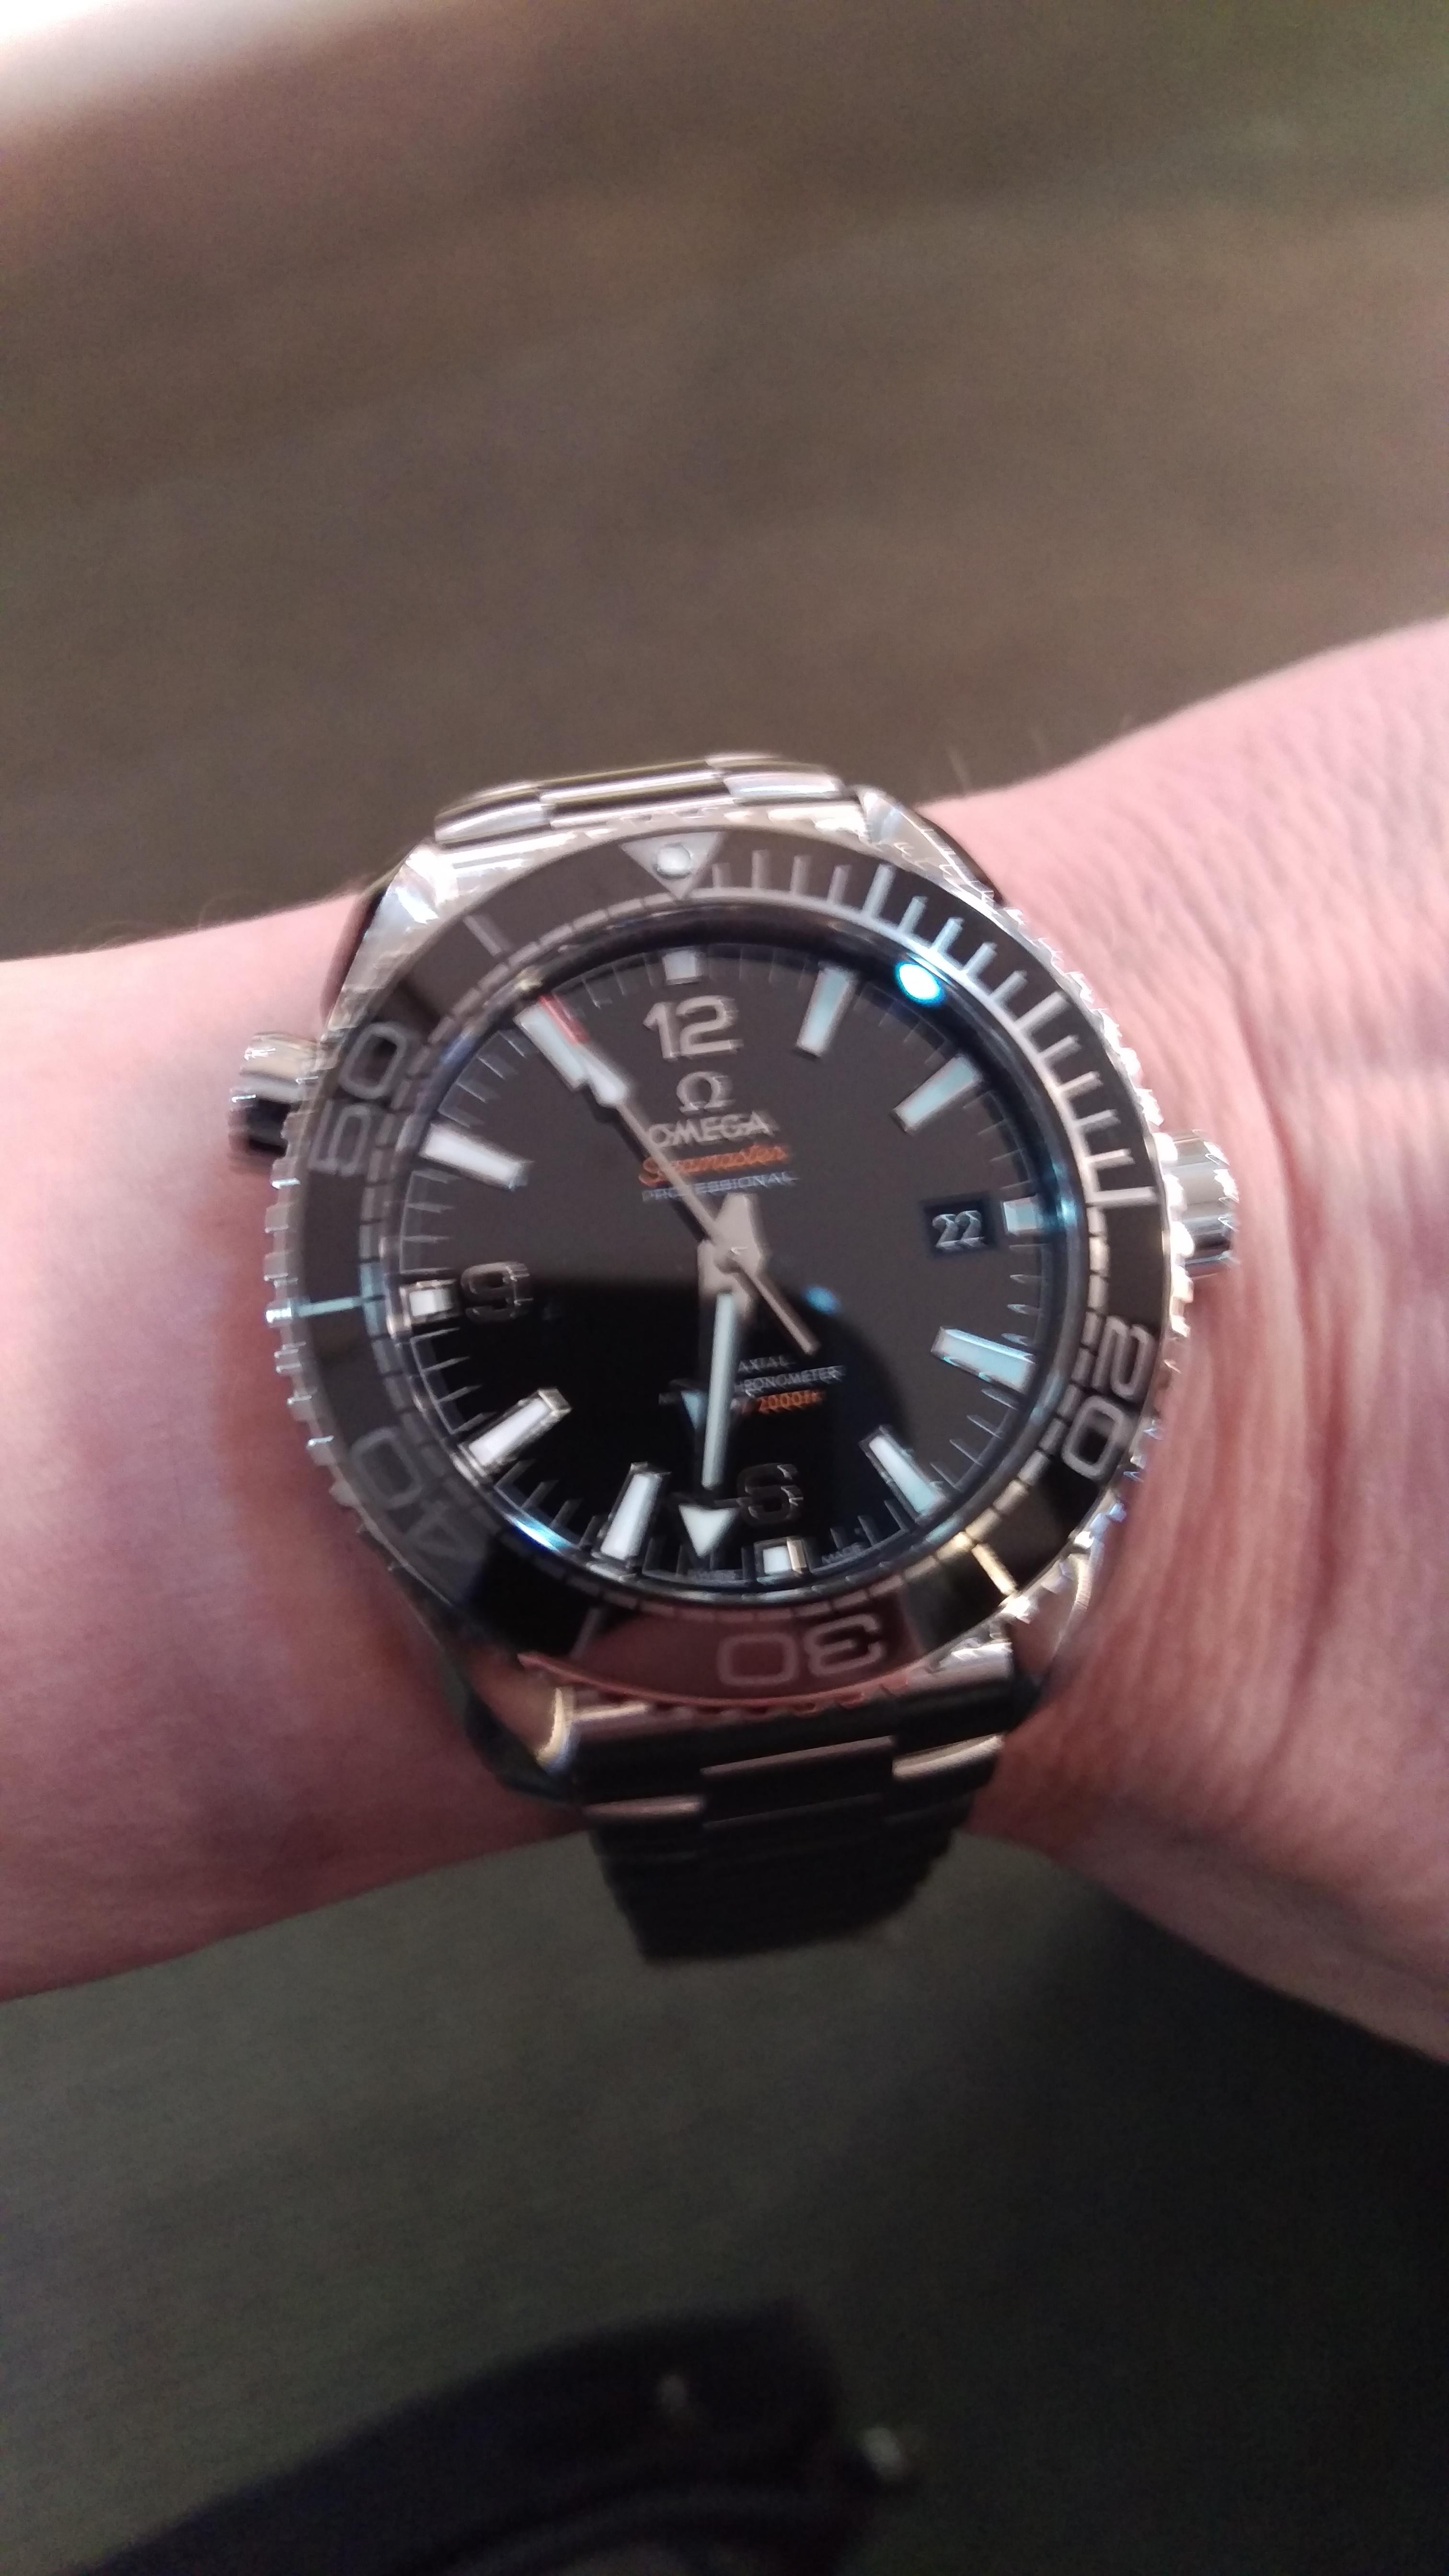 Omega Seamaster Planet Ocean 39.5mm